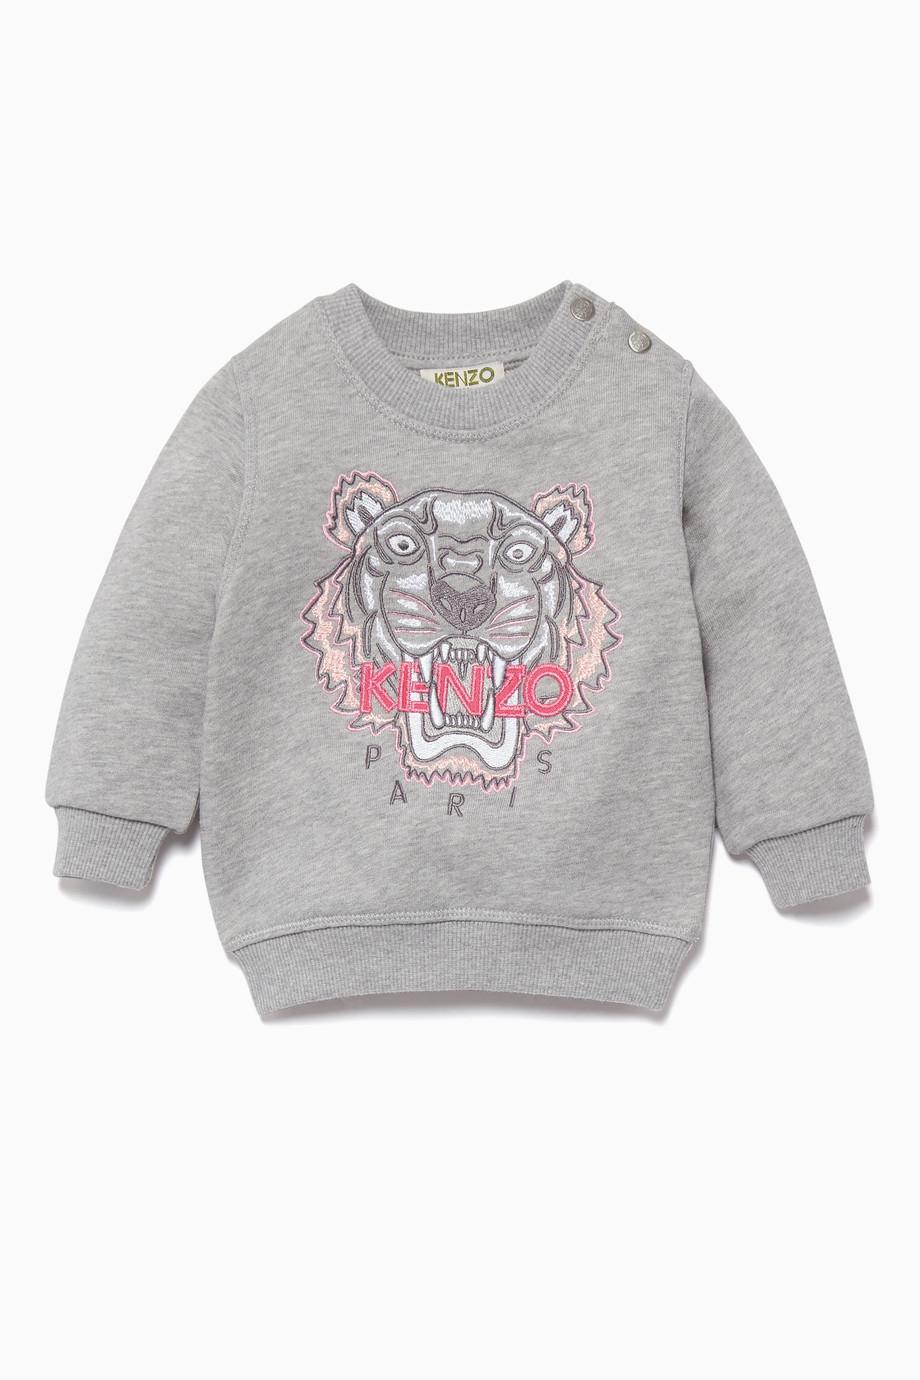 2d284c39b65 Shop Kenzo Grey Grey   Pink Tiger Logo Sweatshirt for Kids